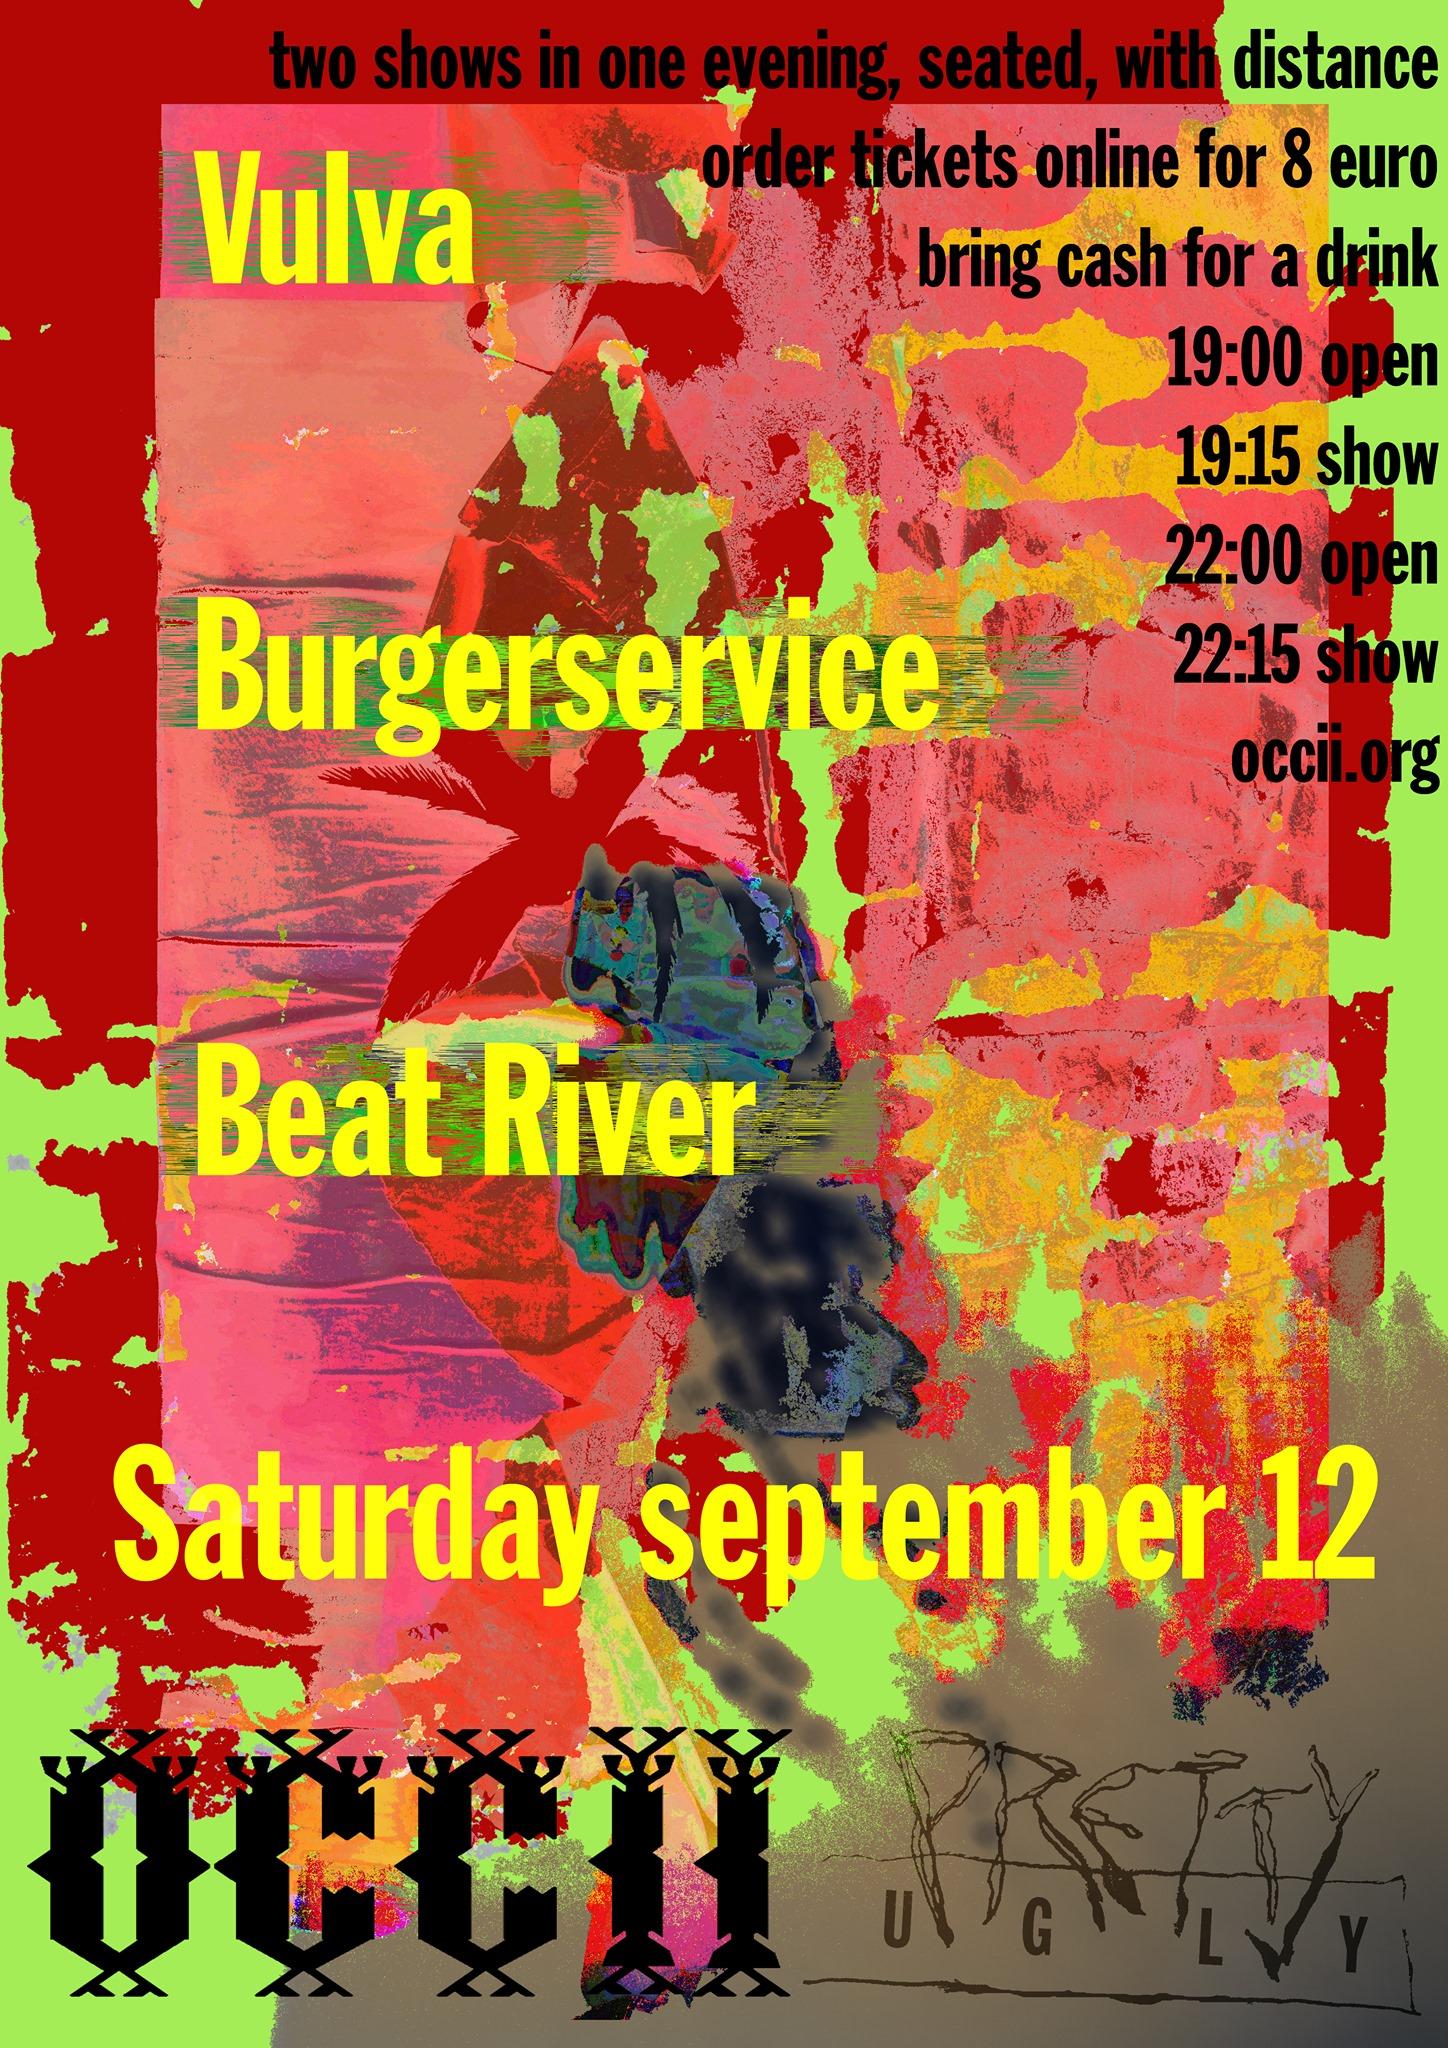 VULVA + BURGERSERVICE + BEAT RIVER